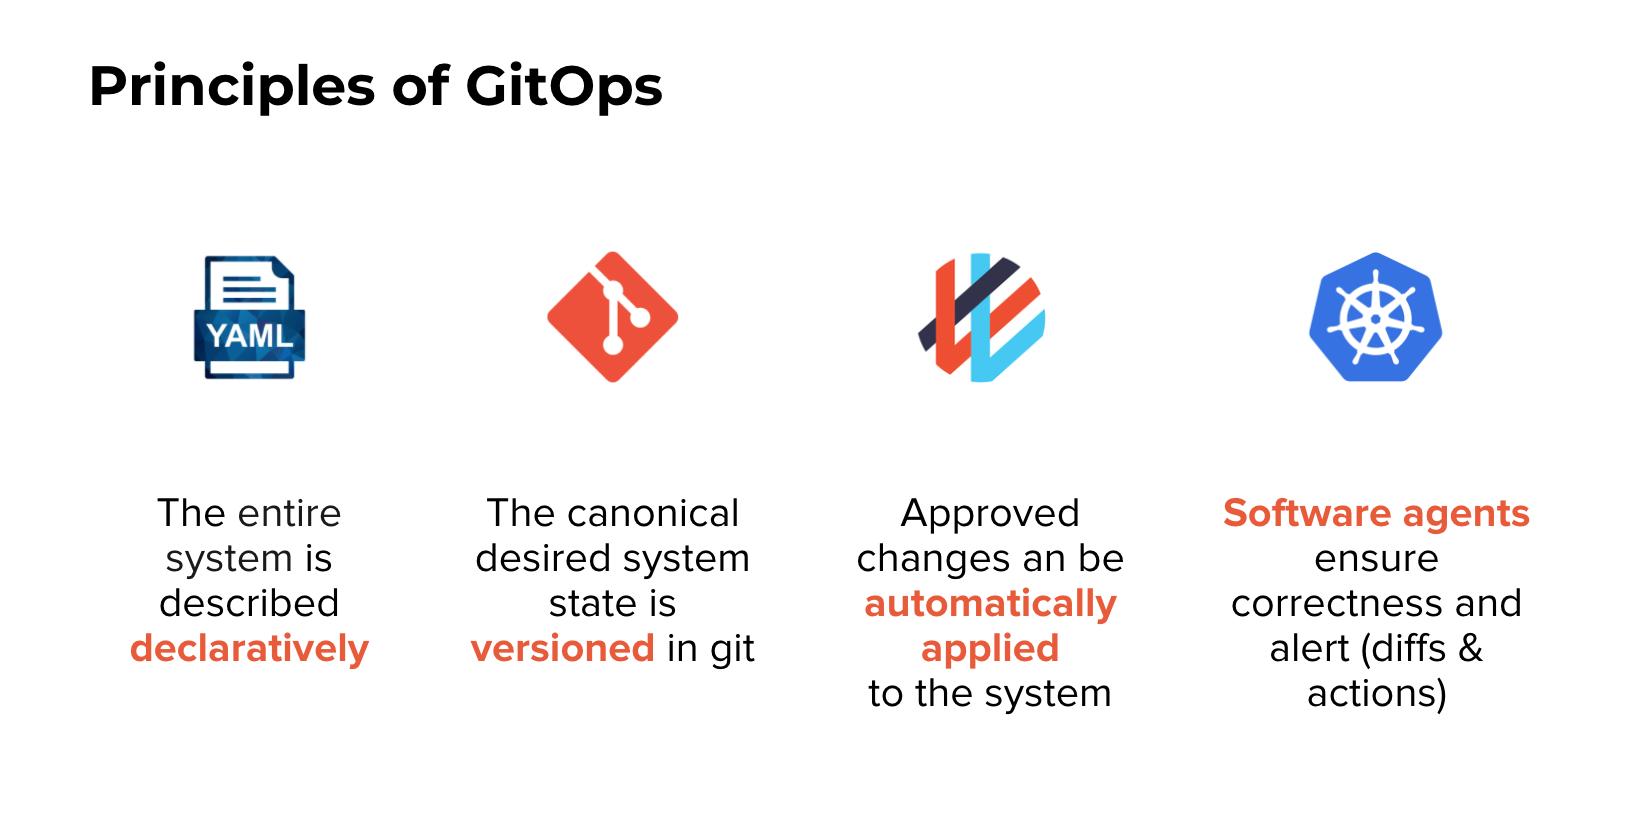 Principles_of_GitOps_2021.png